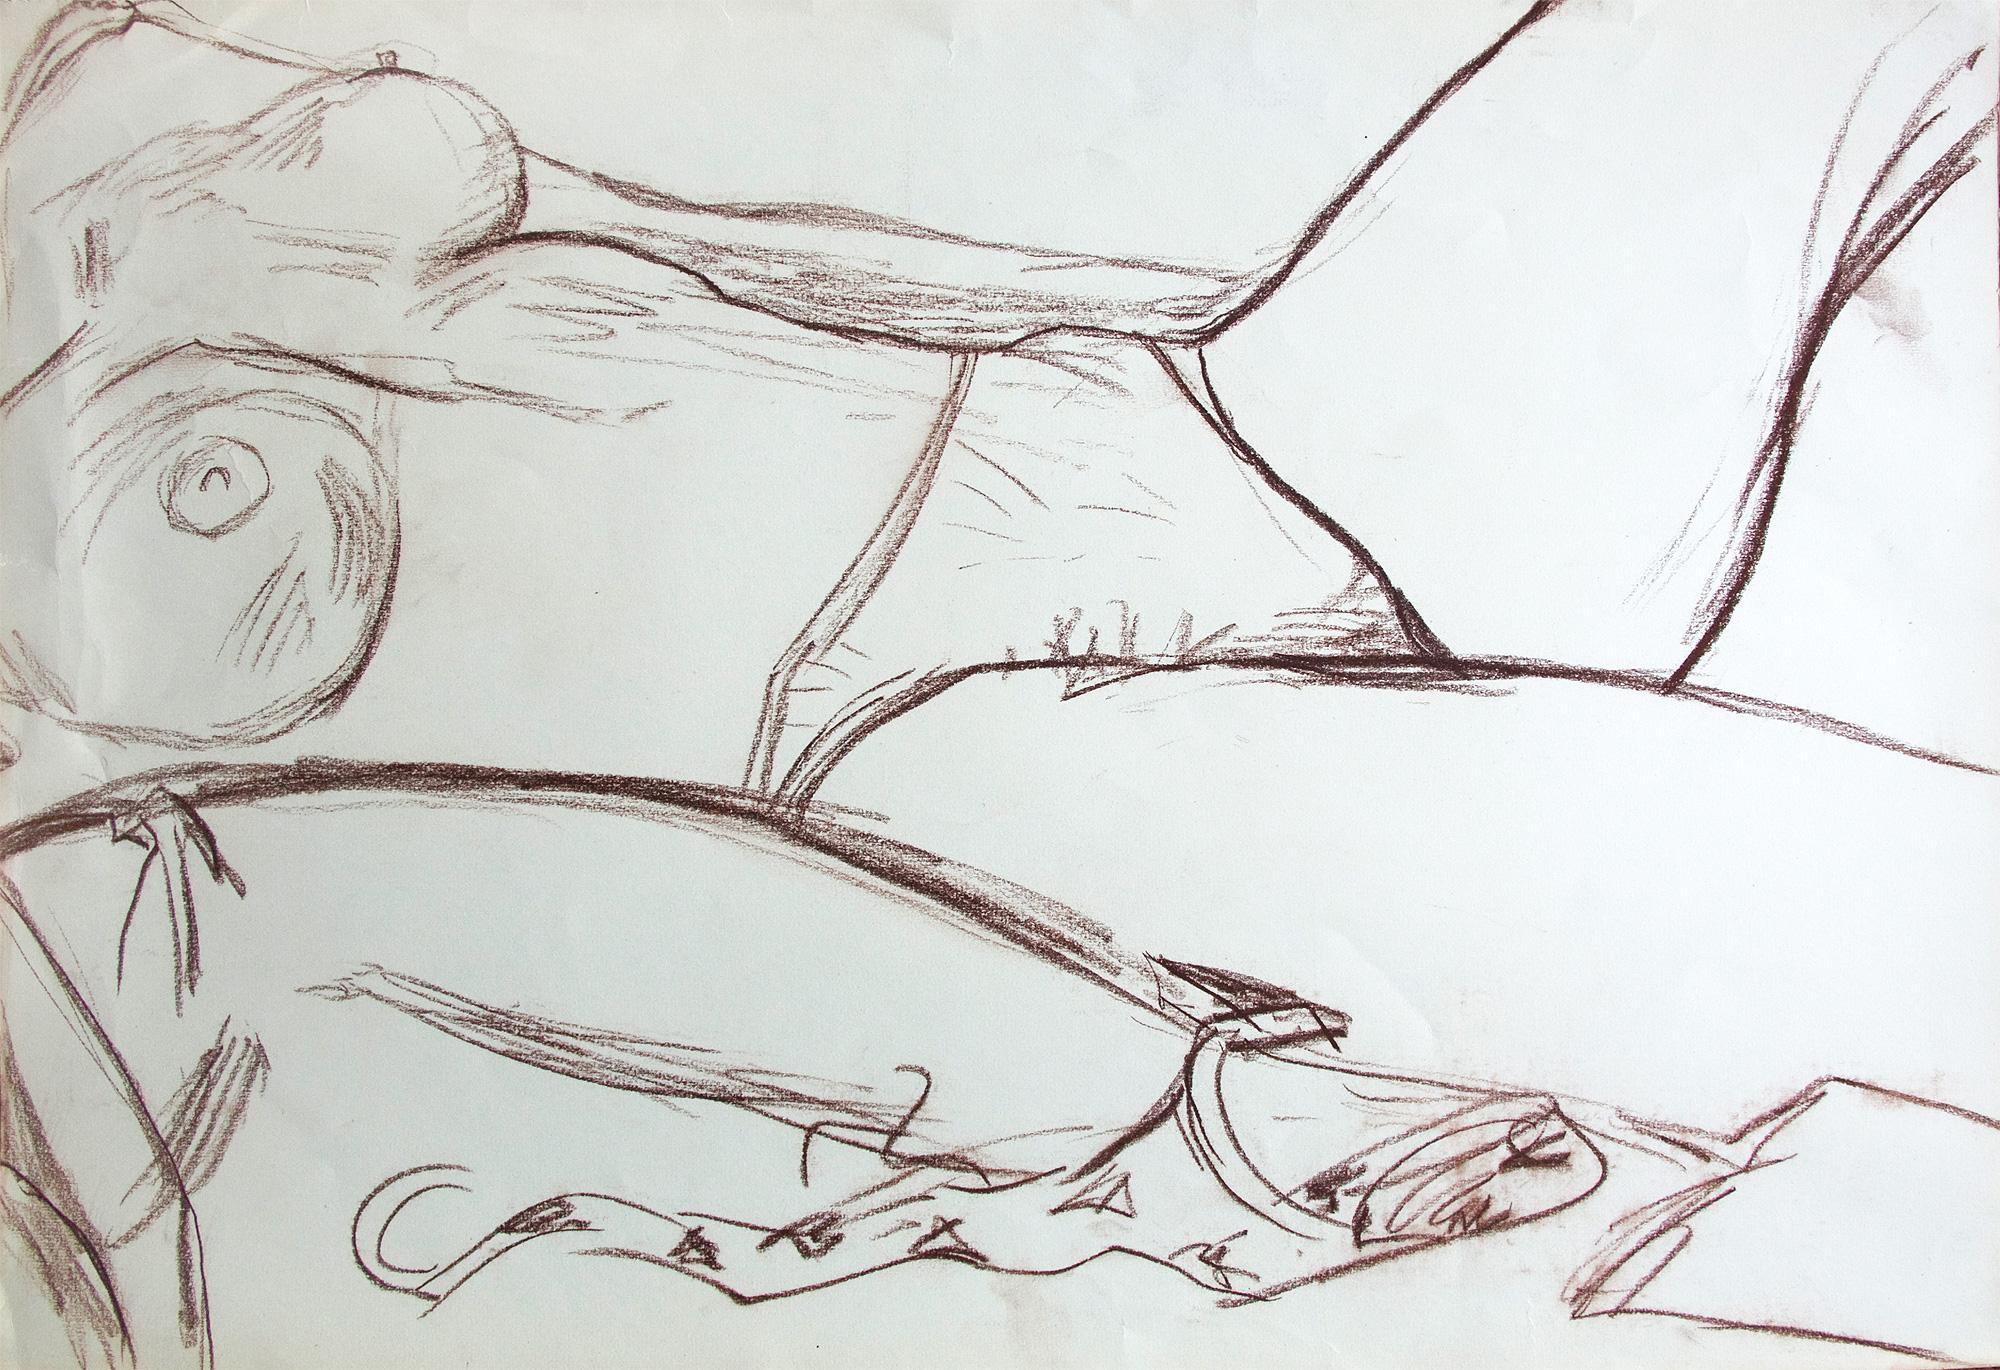 Desnudo con sujetador